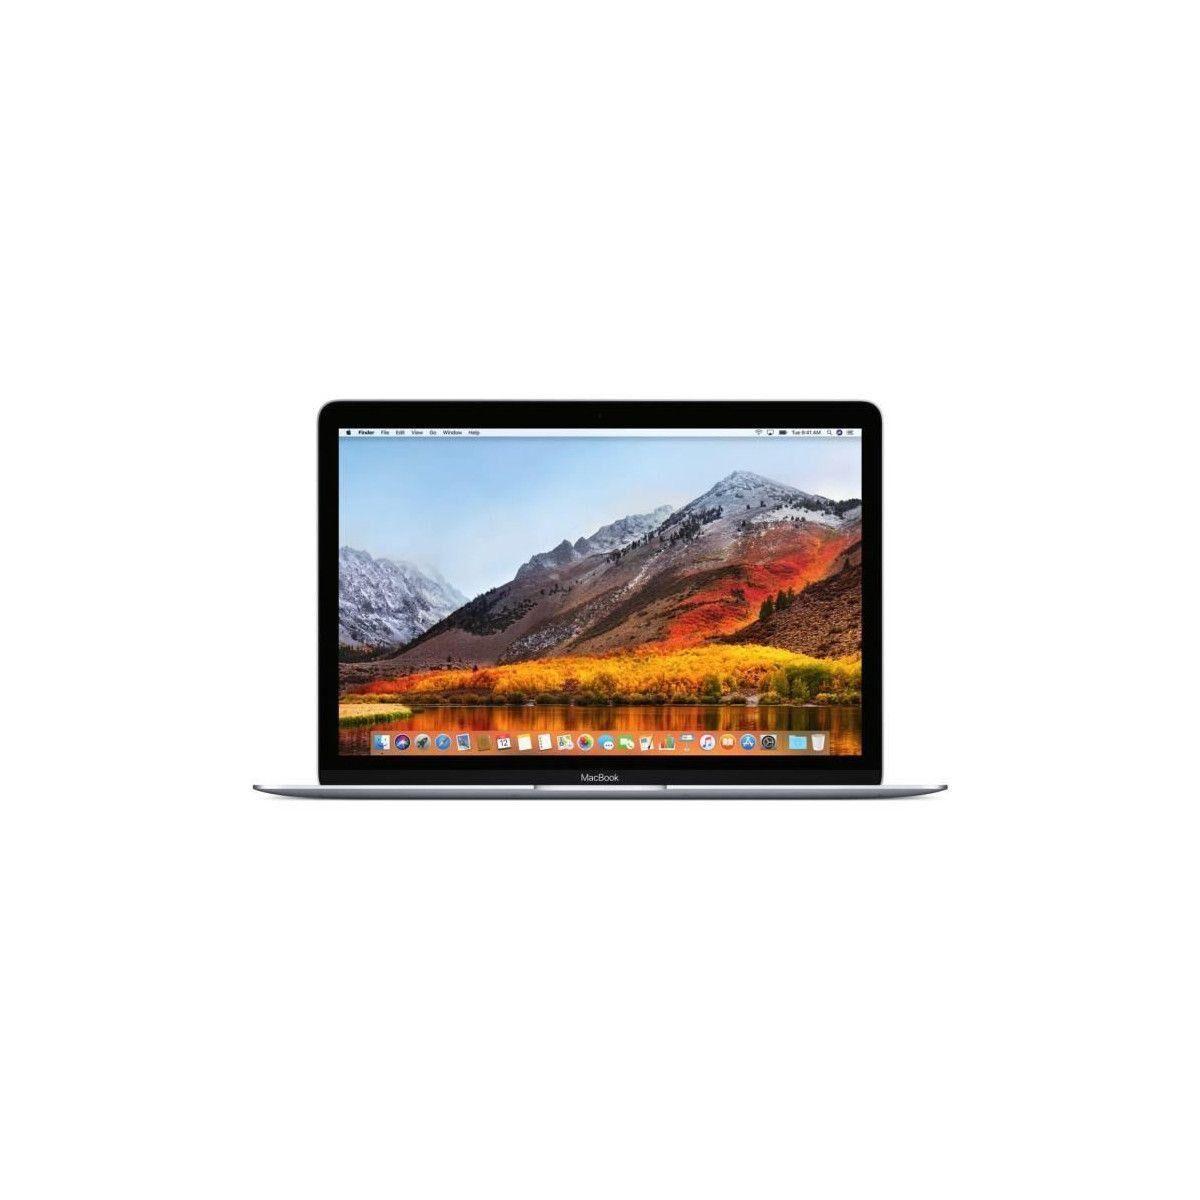 APPLE MacBook MNYH2FN/A - 12 pouces Retina - Intel Core m3 - RAM 8Go - Stockage 256Go SSD - Argent